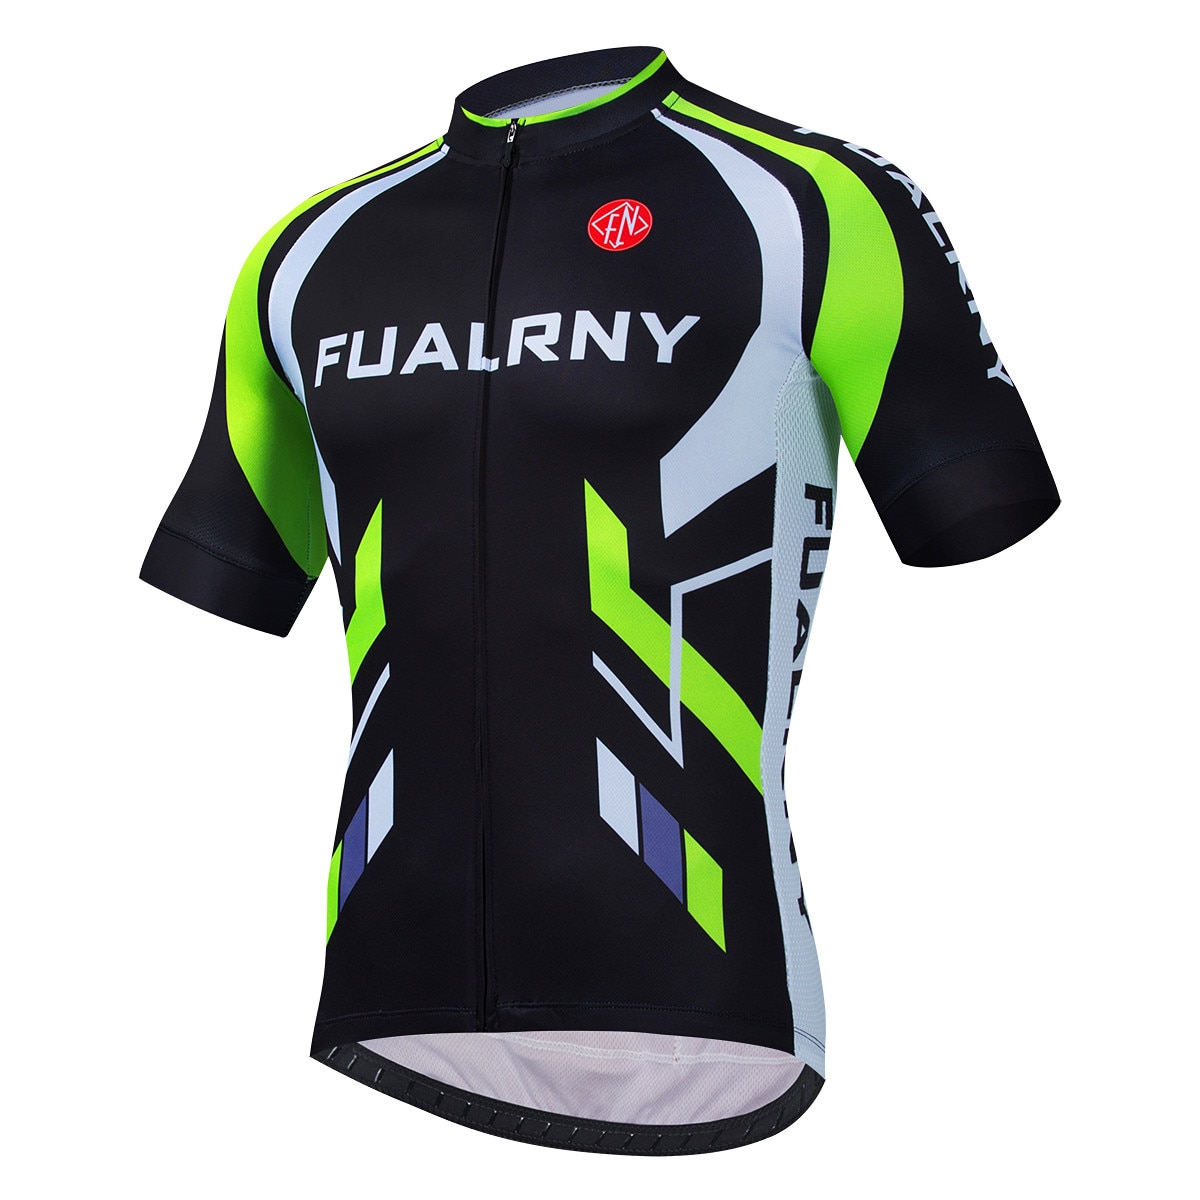 STRAVA-Camiseta de Ciclismo para hombre, ropa de secado rápido para Ciclismo de...